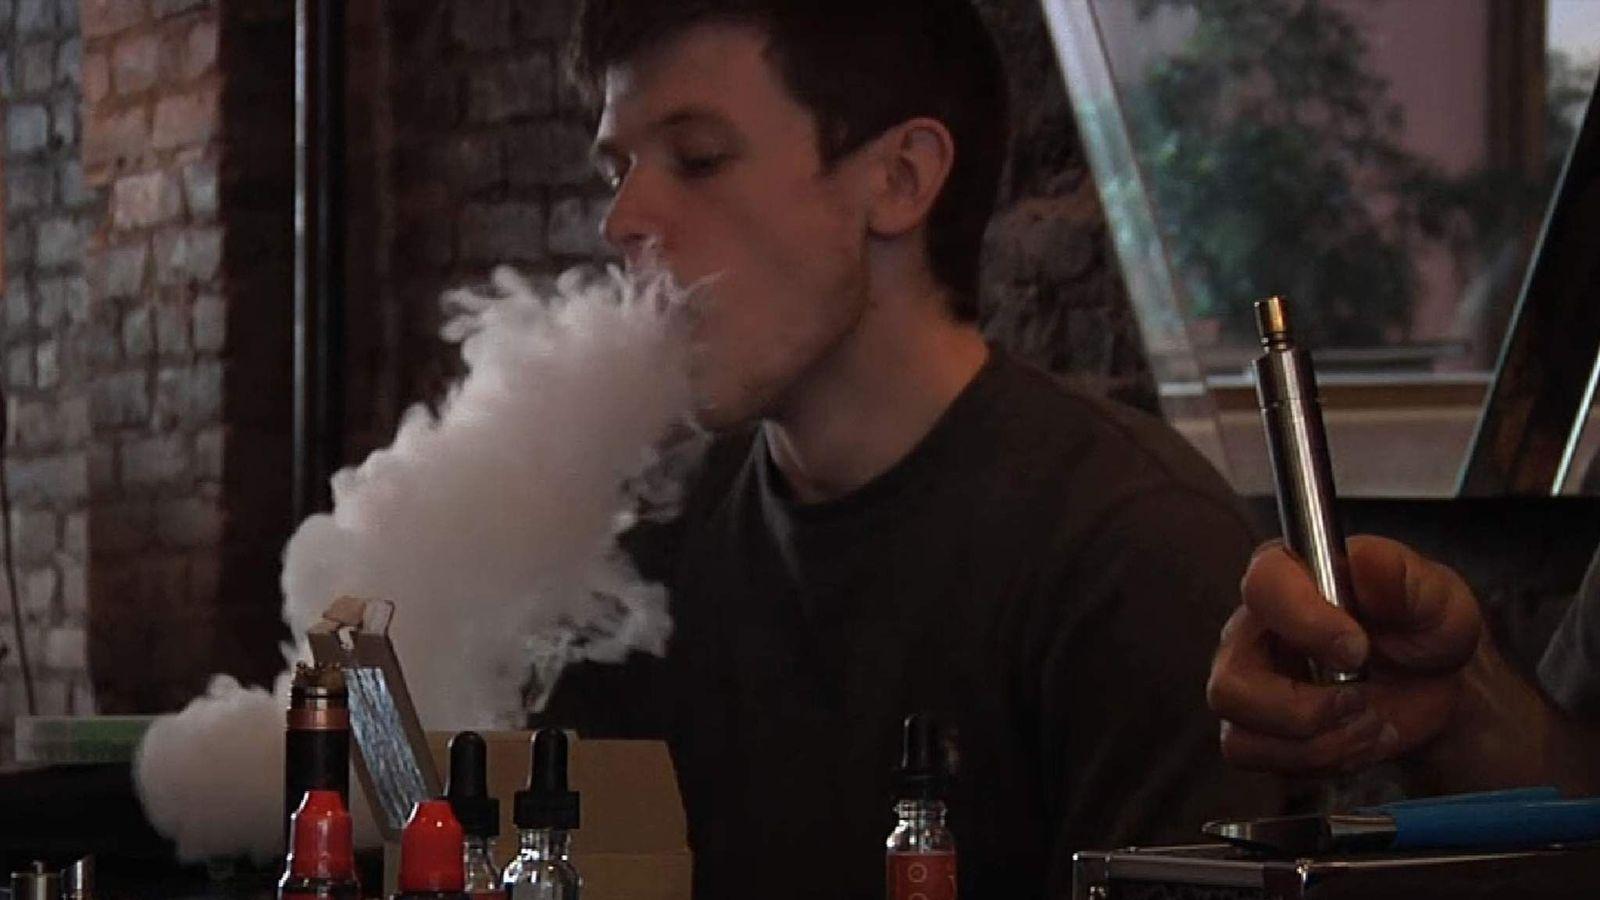 E-cigarette use has soared in recent years